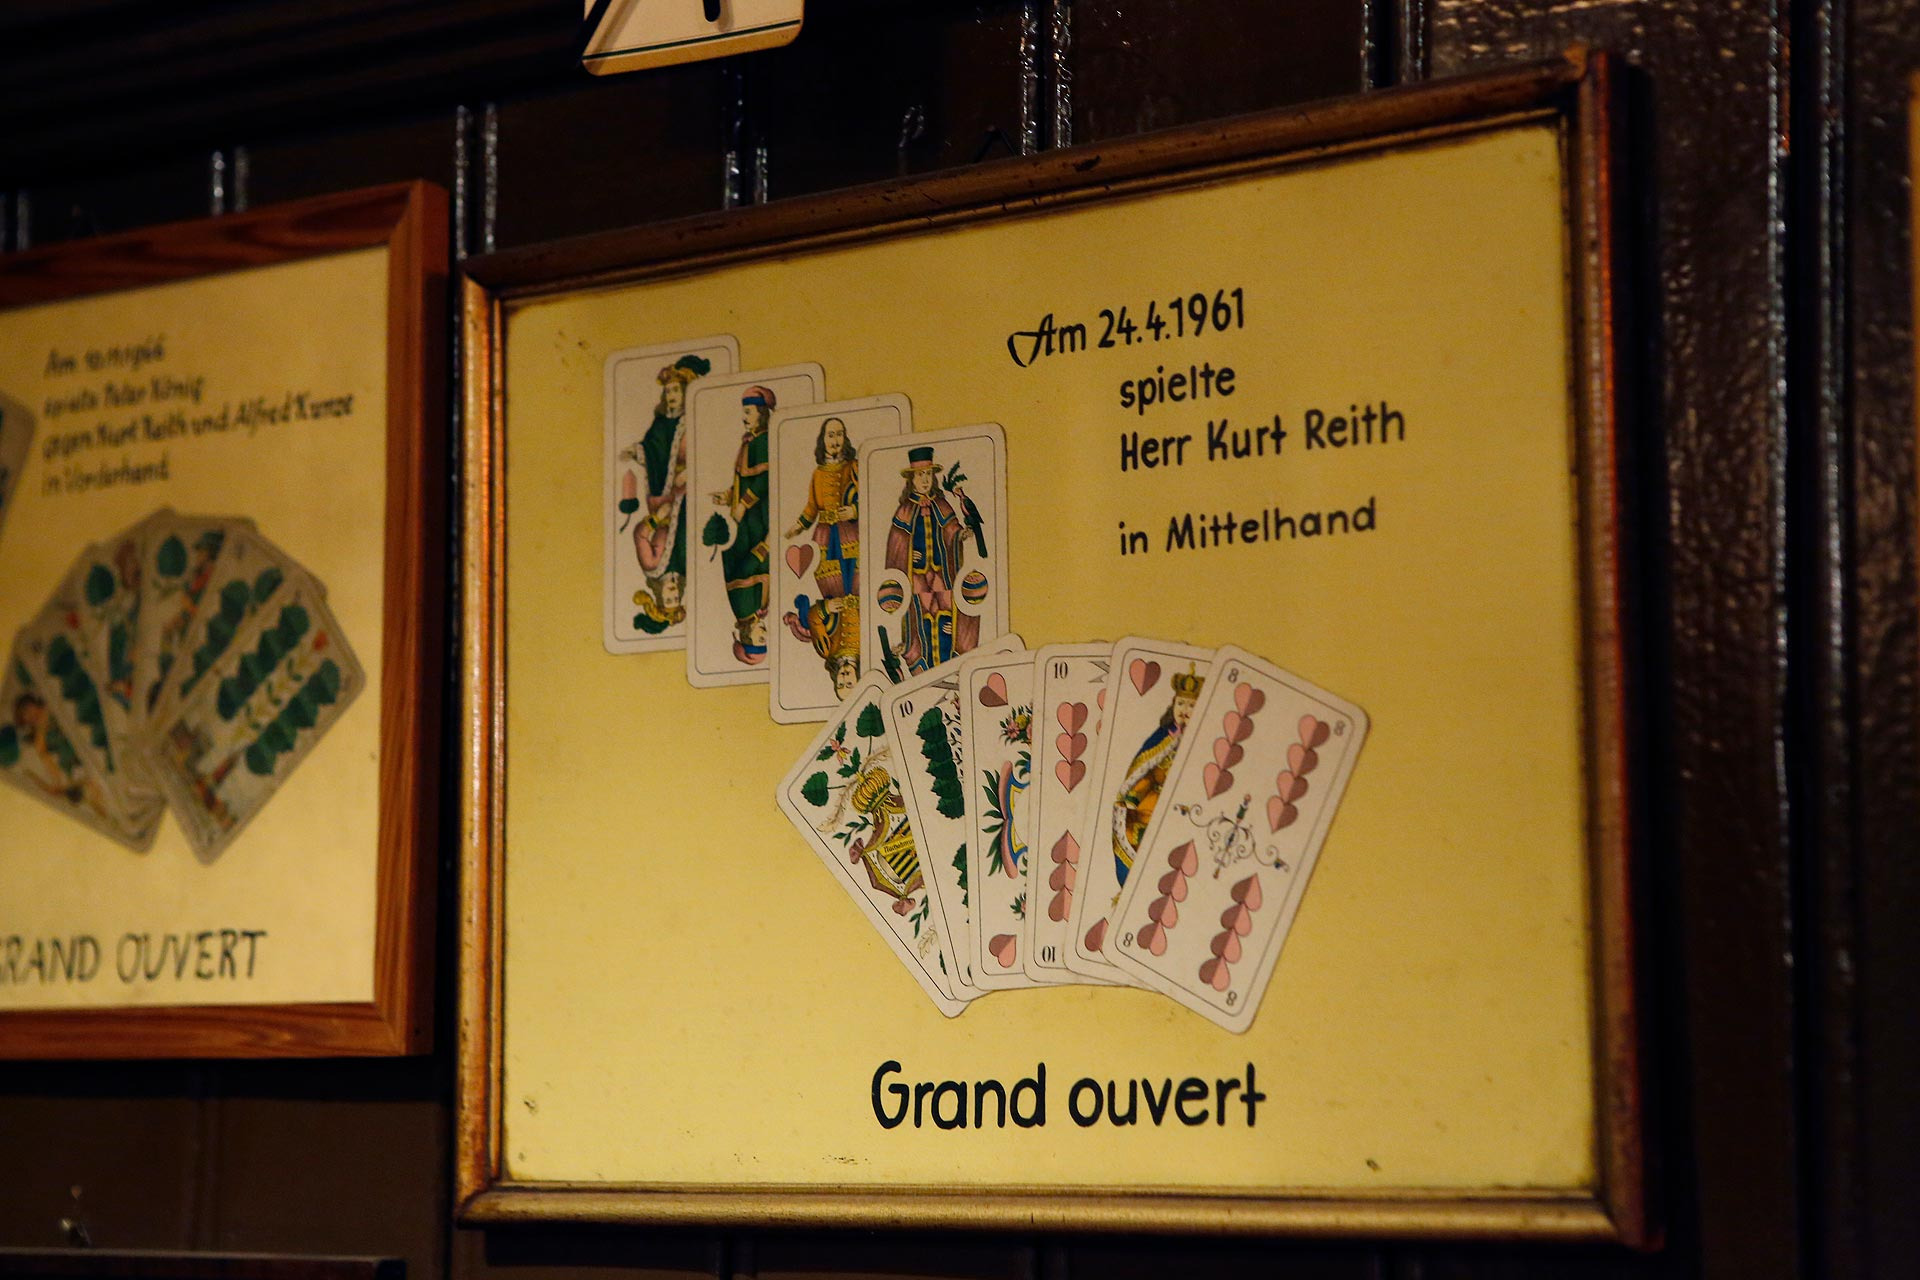 Das Skatblatt hängt seit 1961 an der Wand der Bierkneipe.